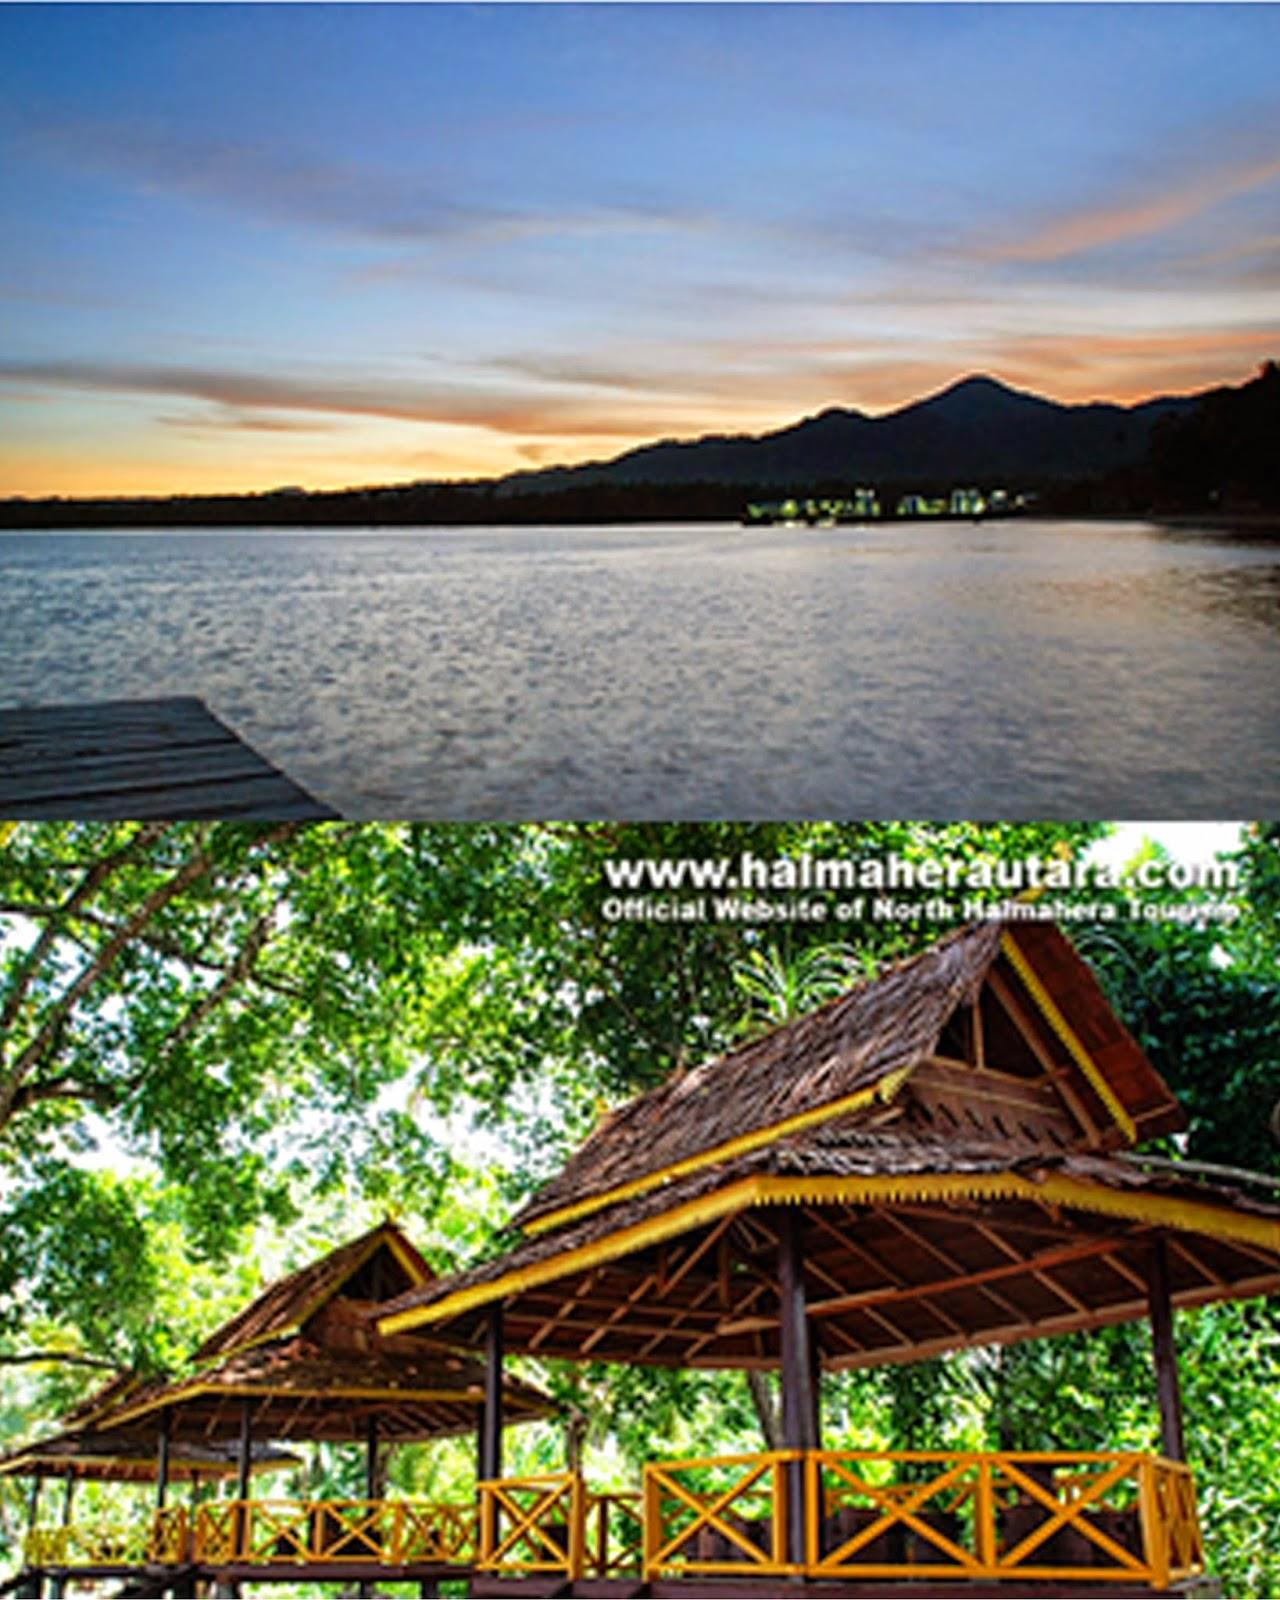 Pantai Kupa Kupa - Tobelo, Halmahera Utara